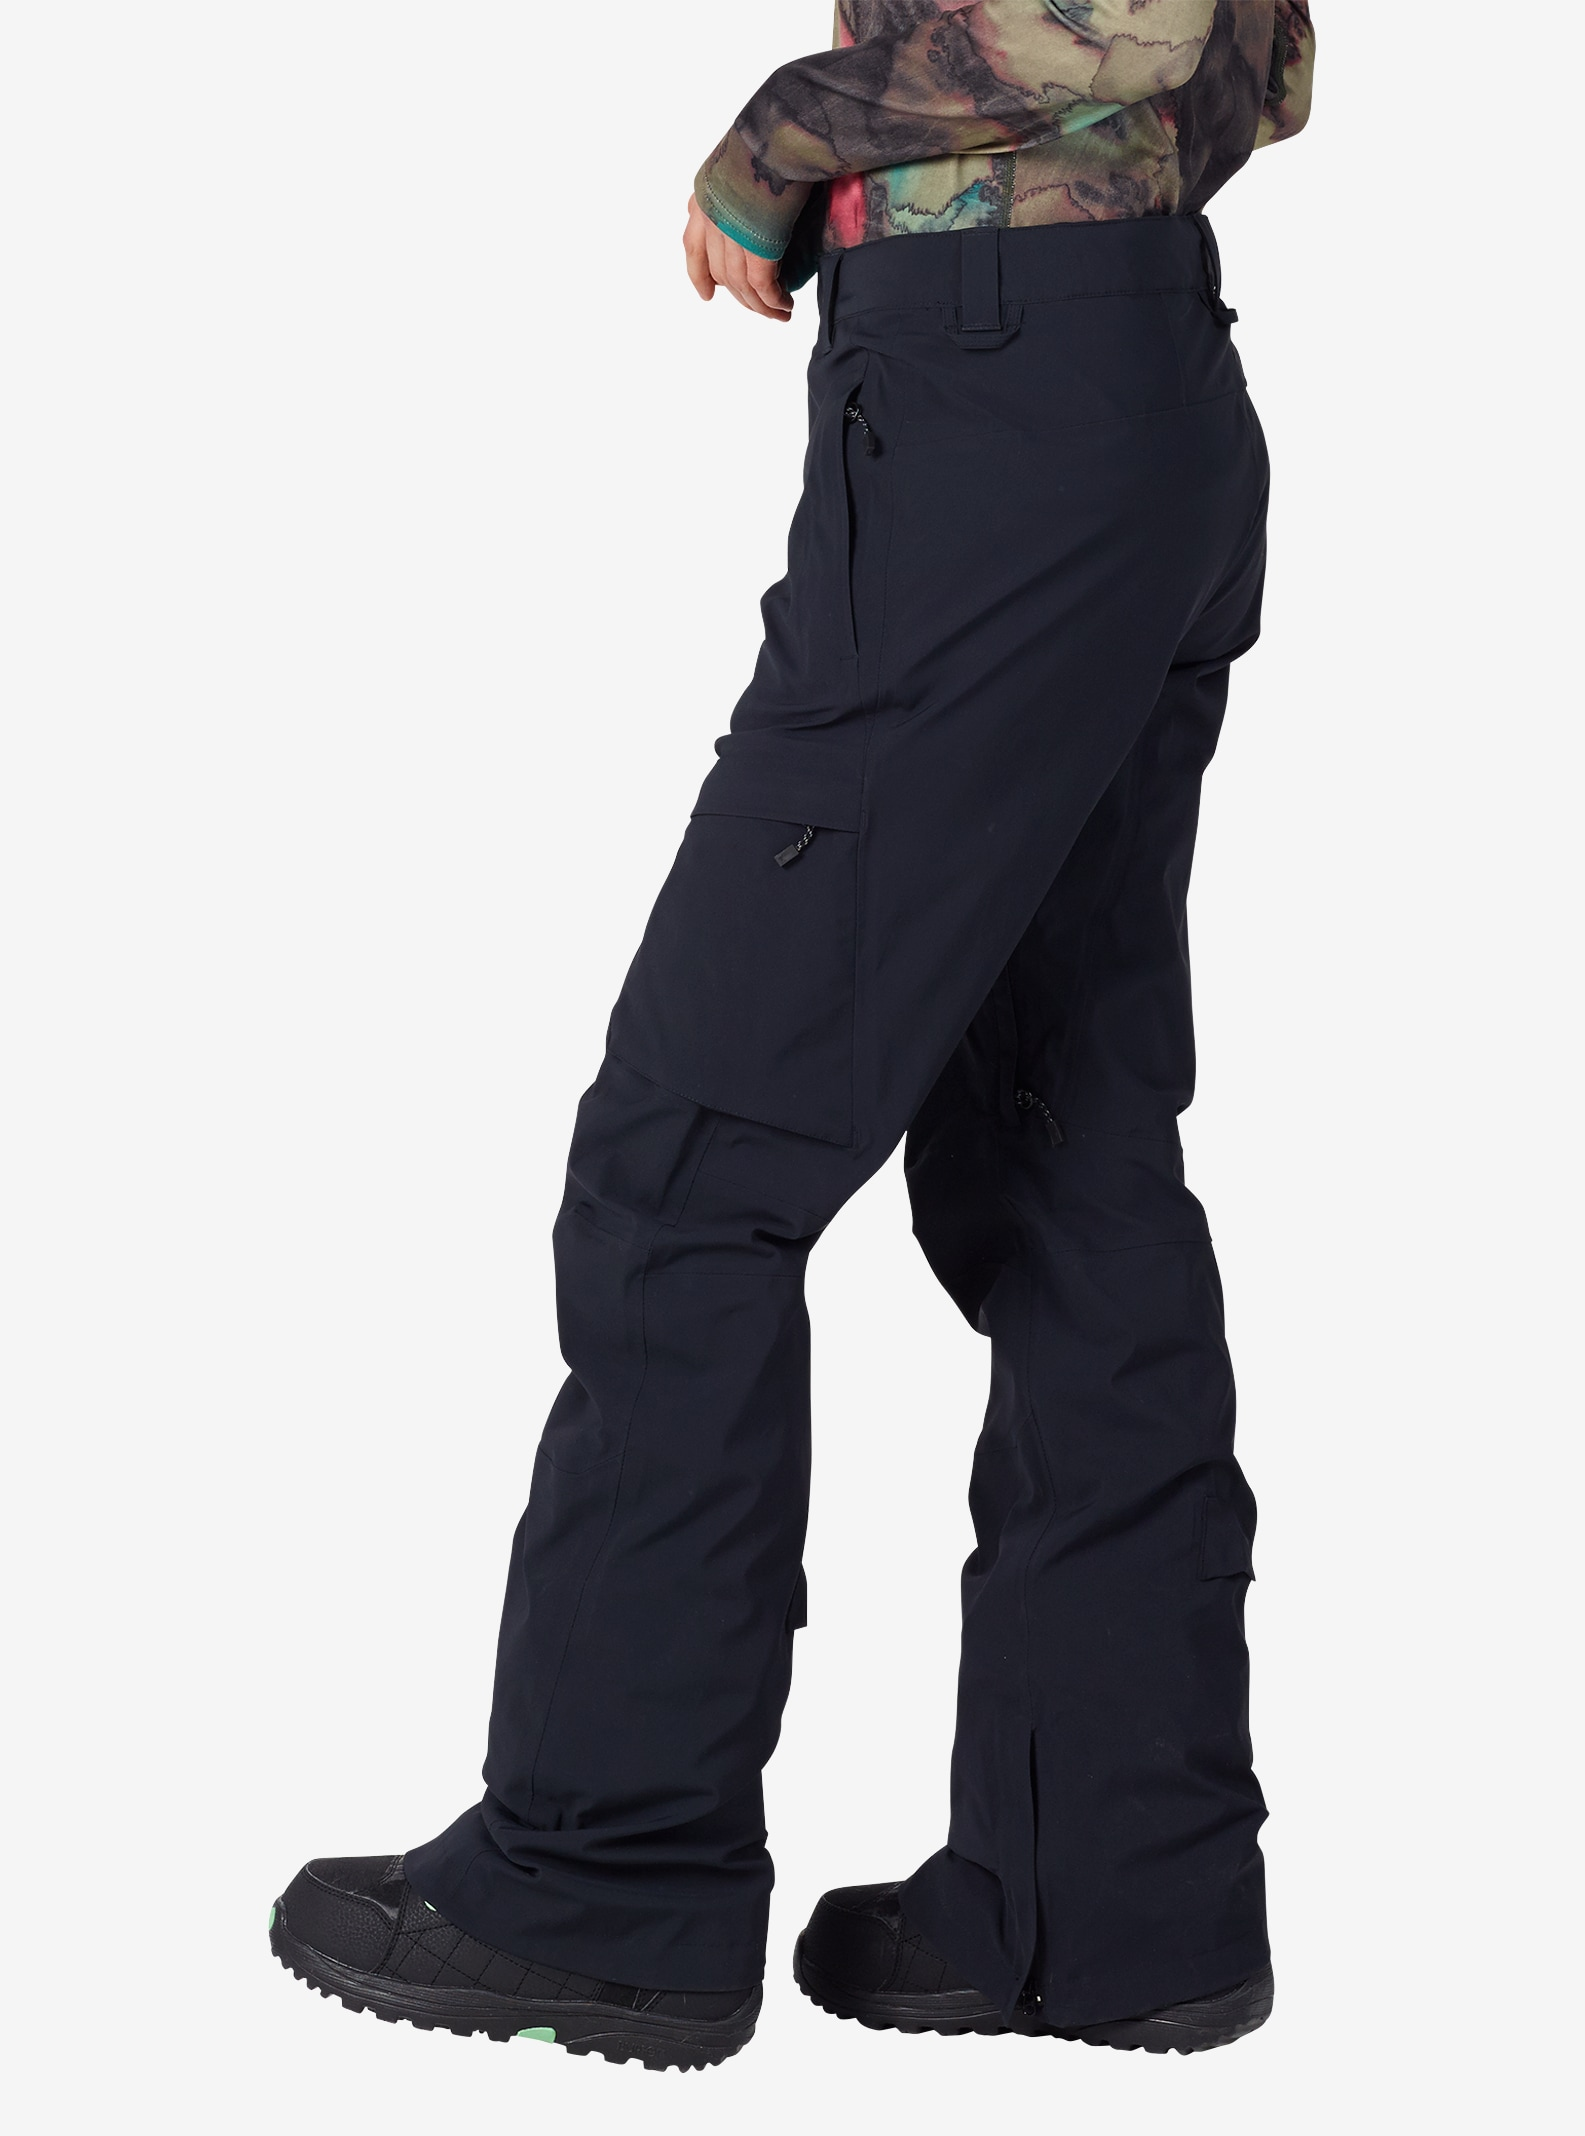 Women's Burton [ak] GORE‑TEX® Summit Pant shown in True Black